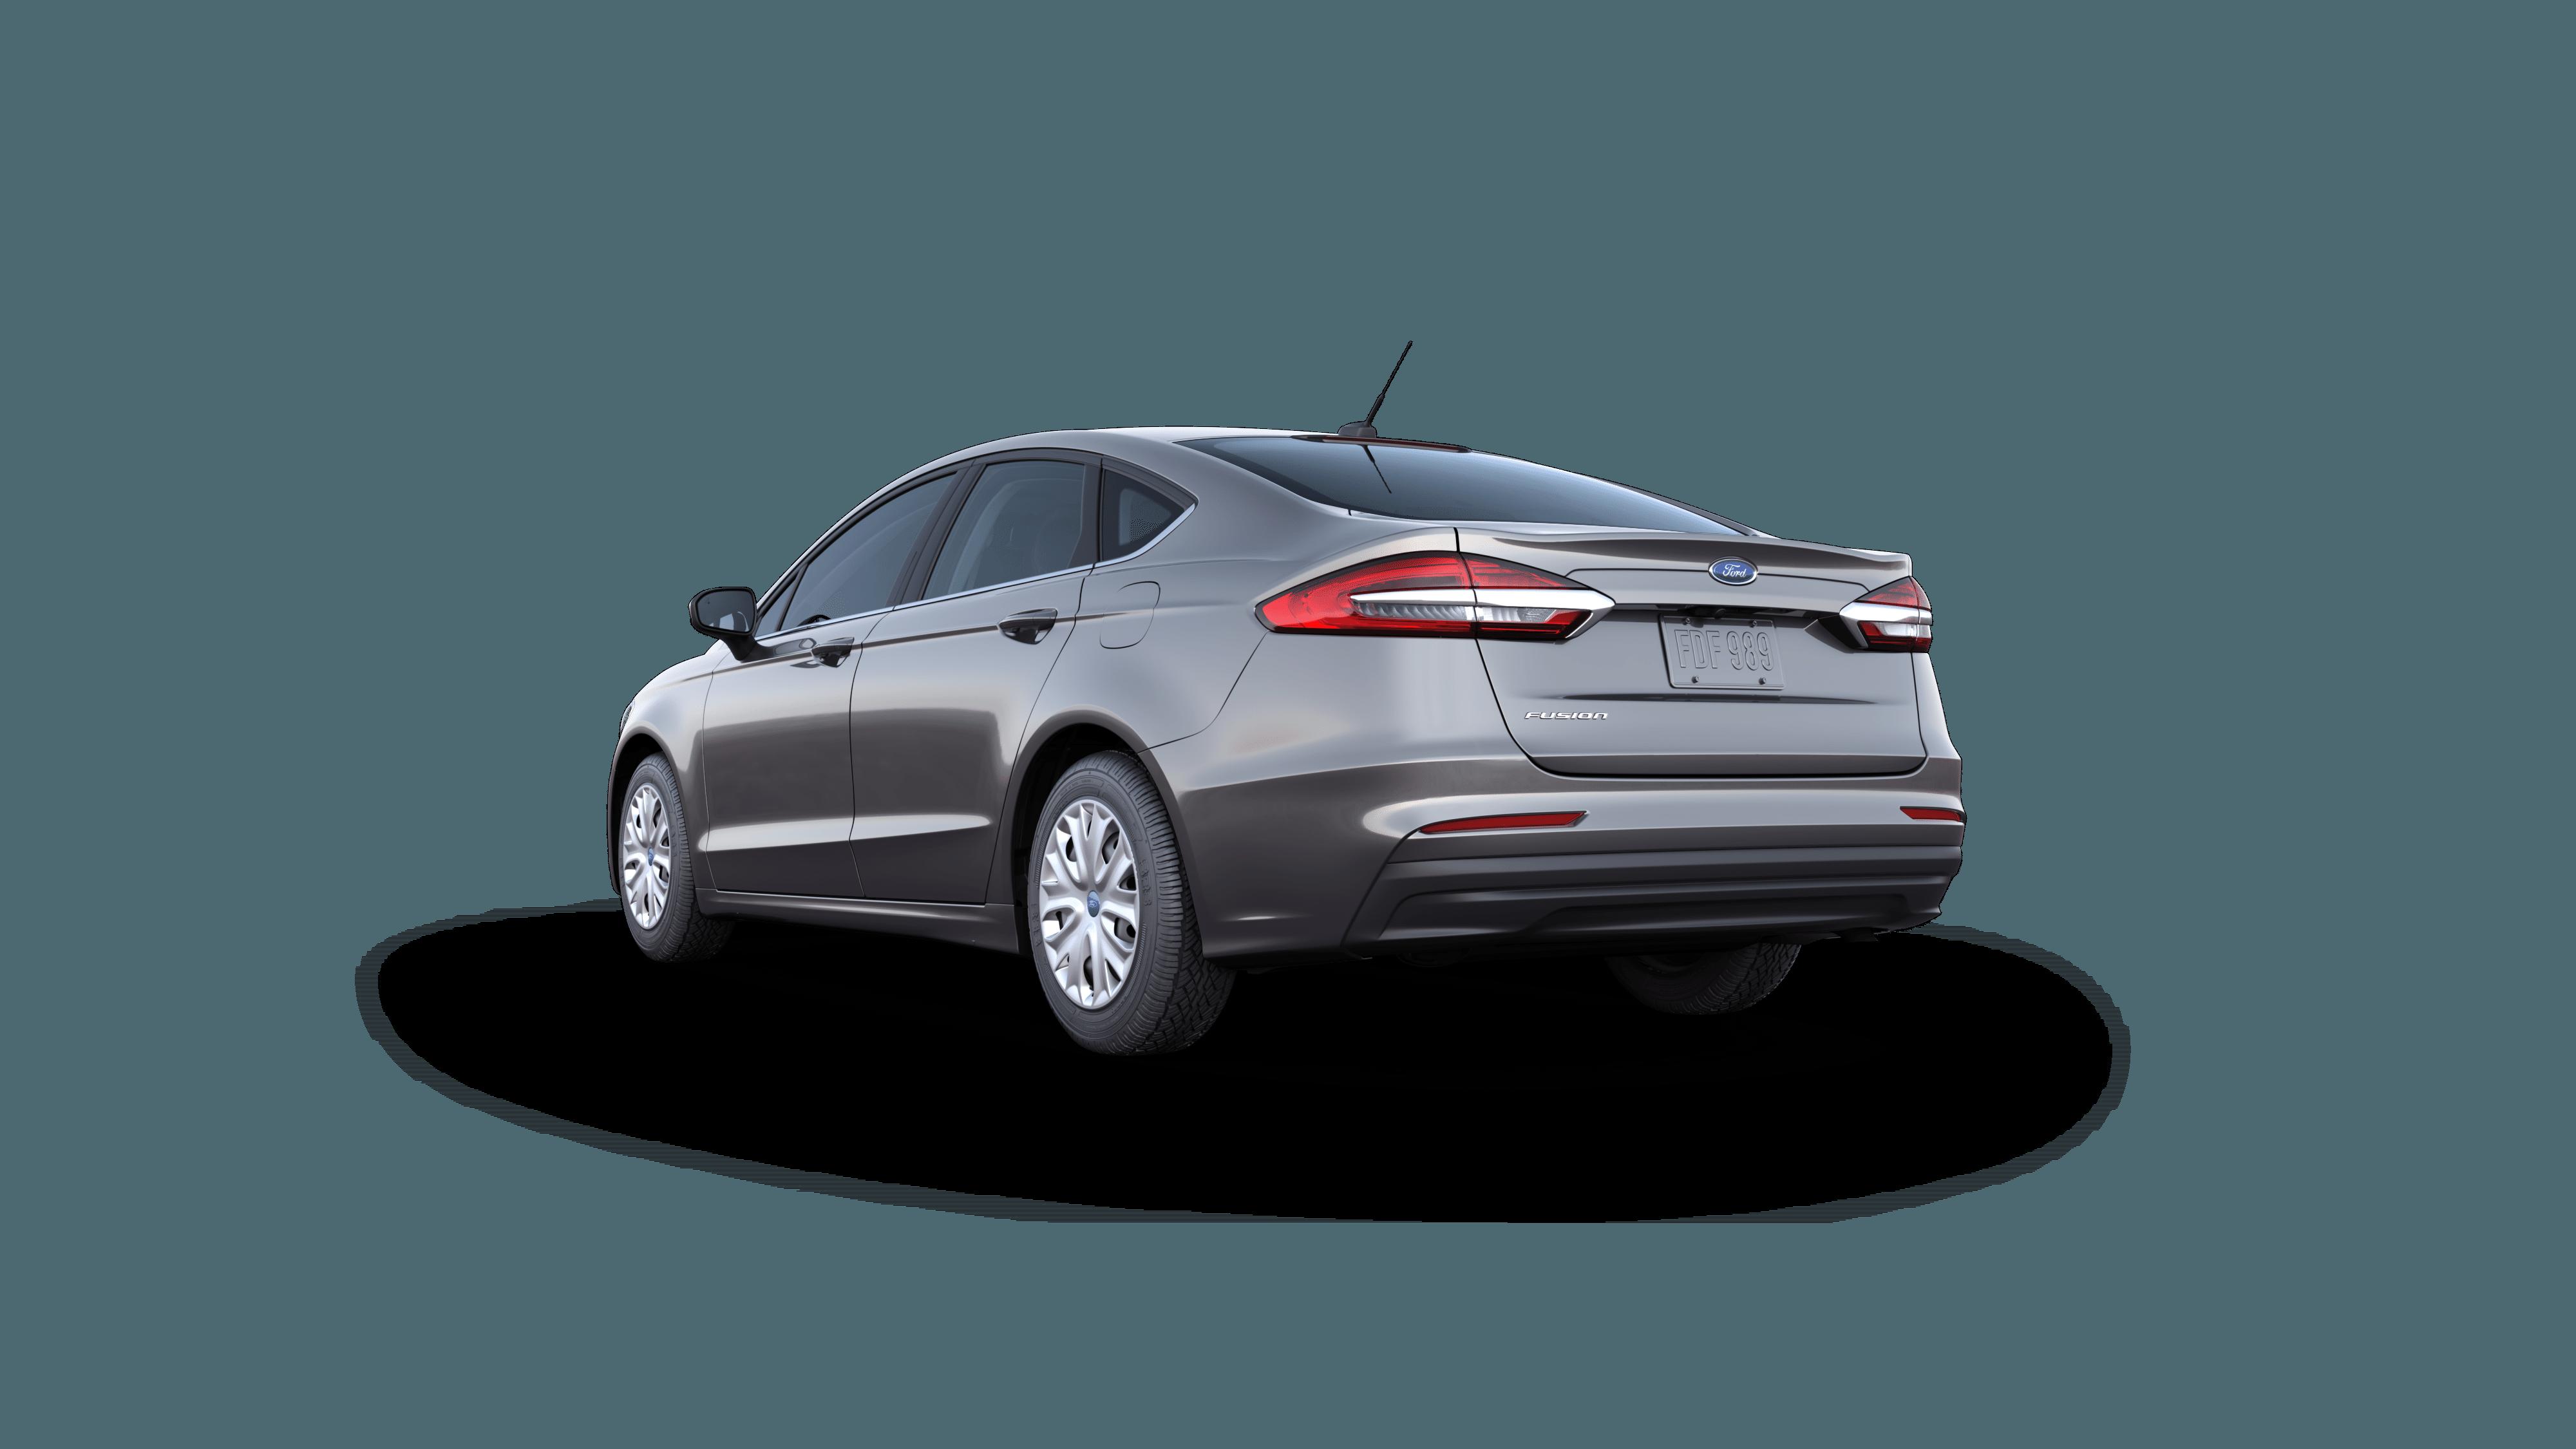 2019 Ford Fusion Vehicle Photo in Okmulgee, OK 74447